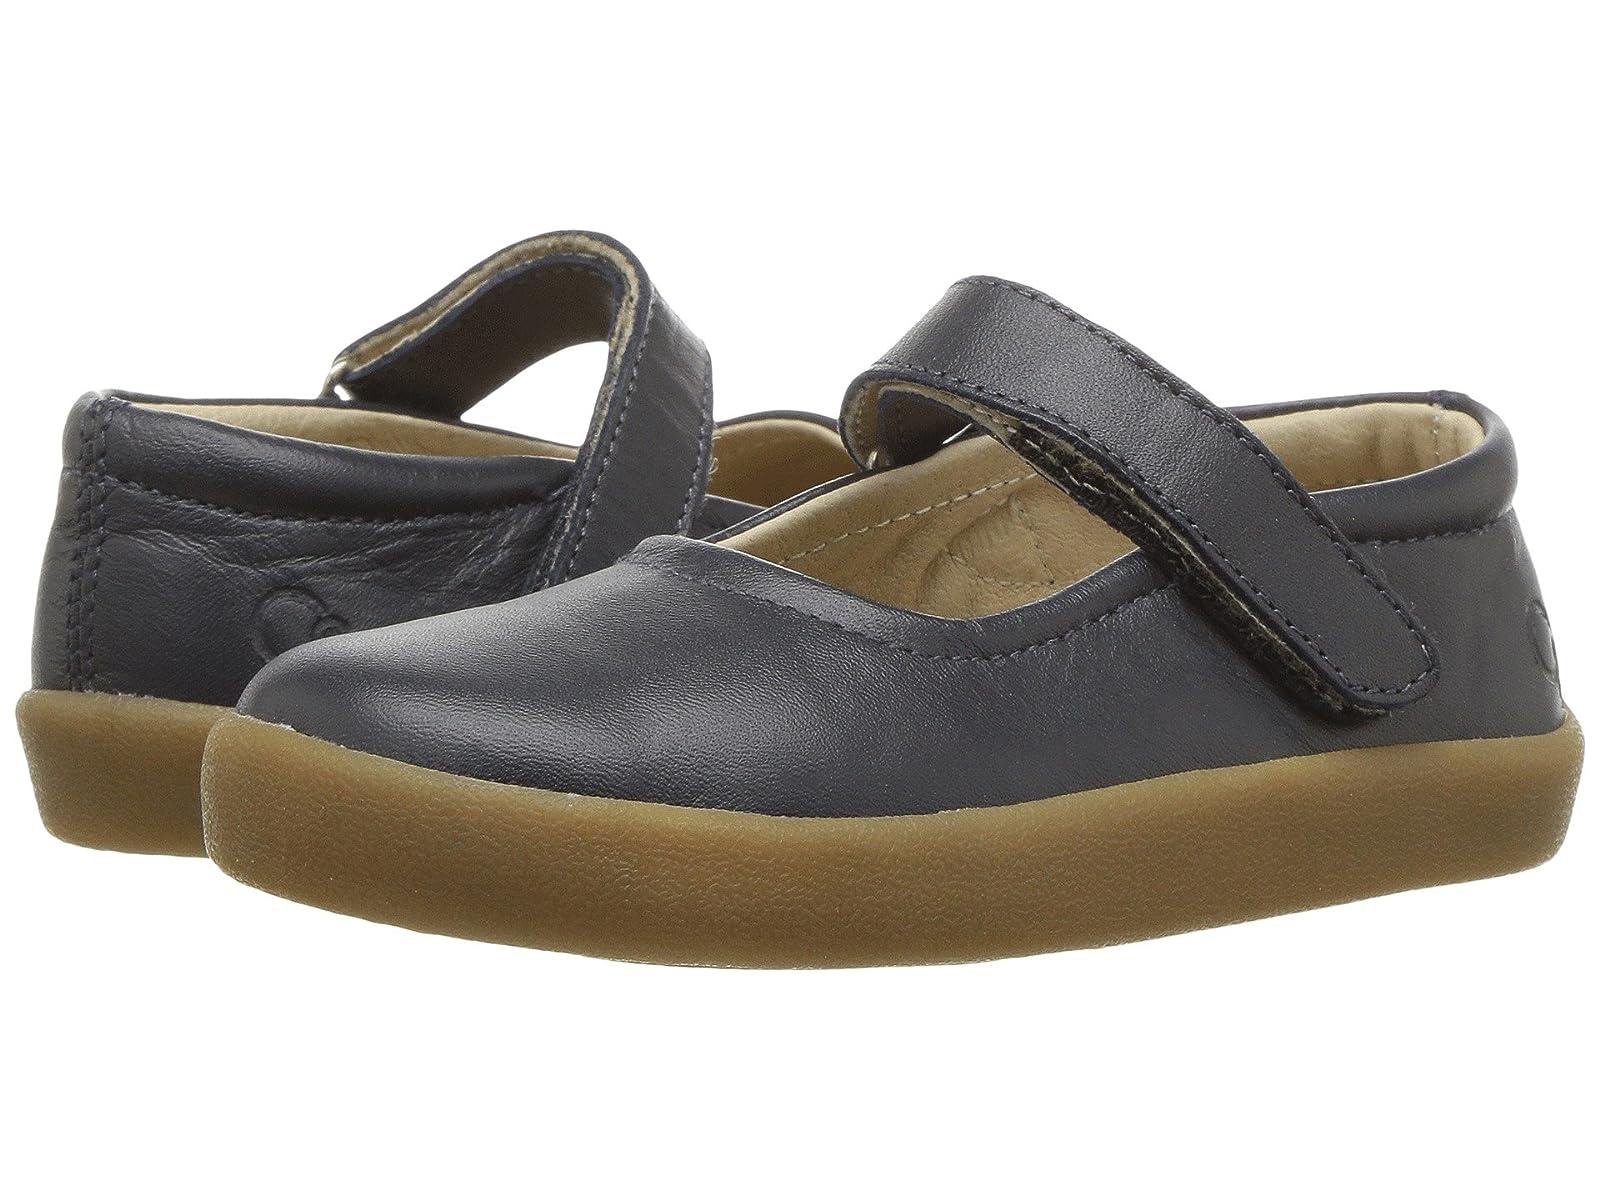 Old Soles Missy Shoe (Toddler/Little Kid)Atmospheric grades have affordable shoes